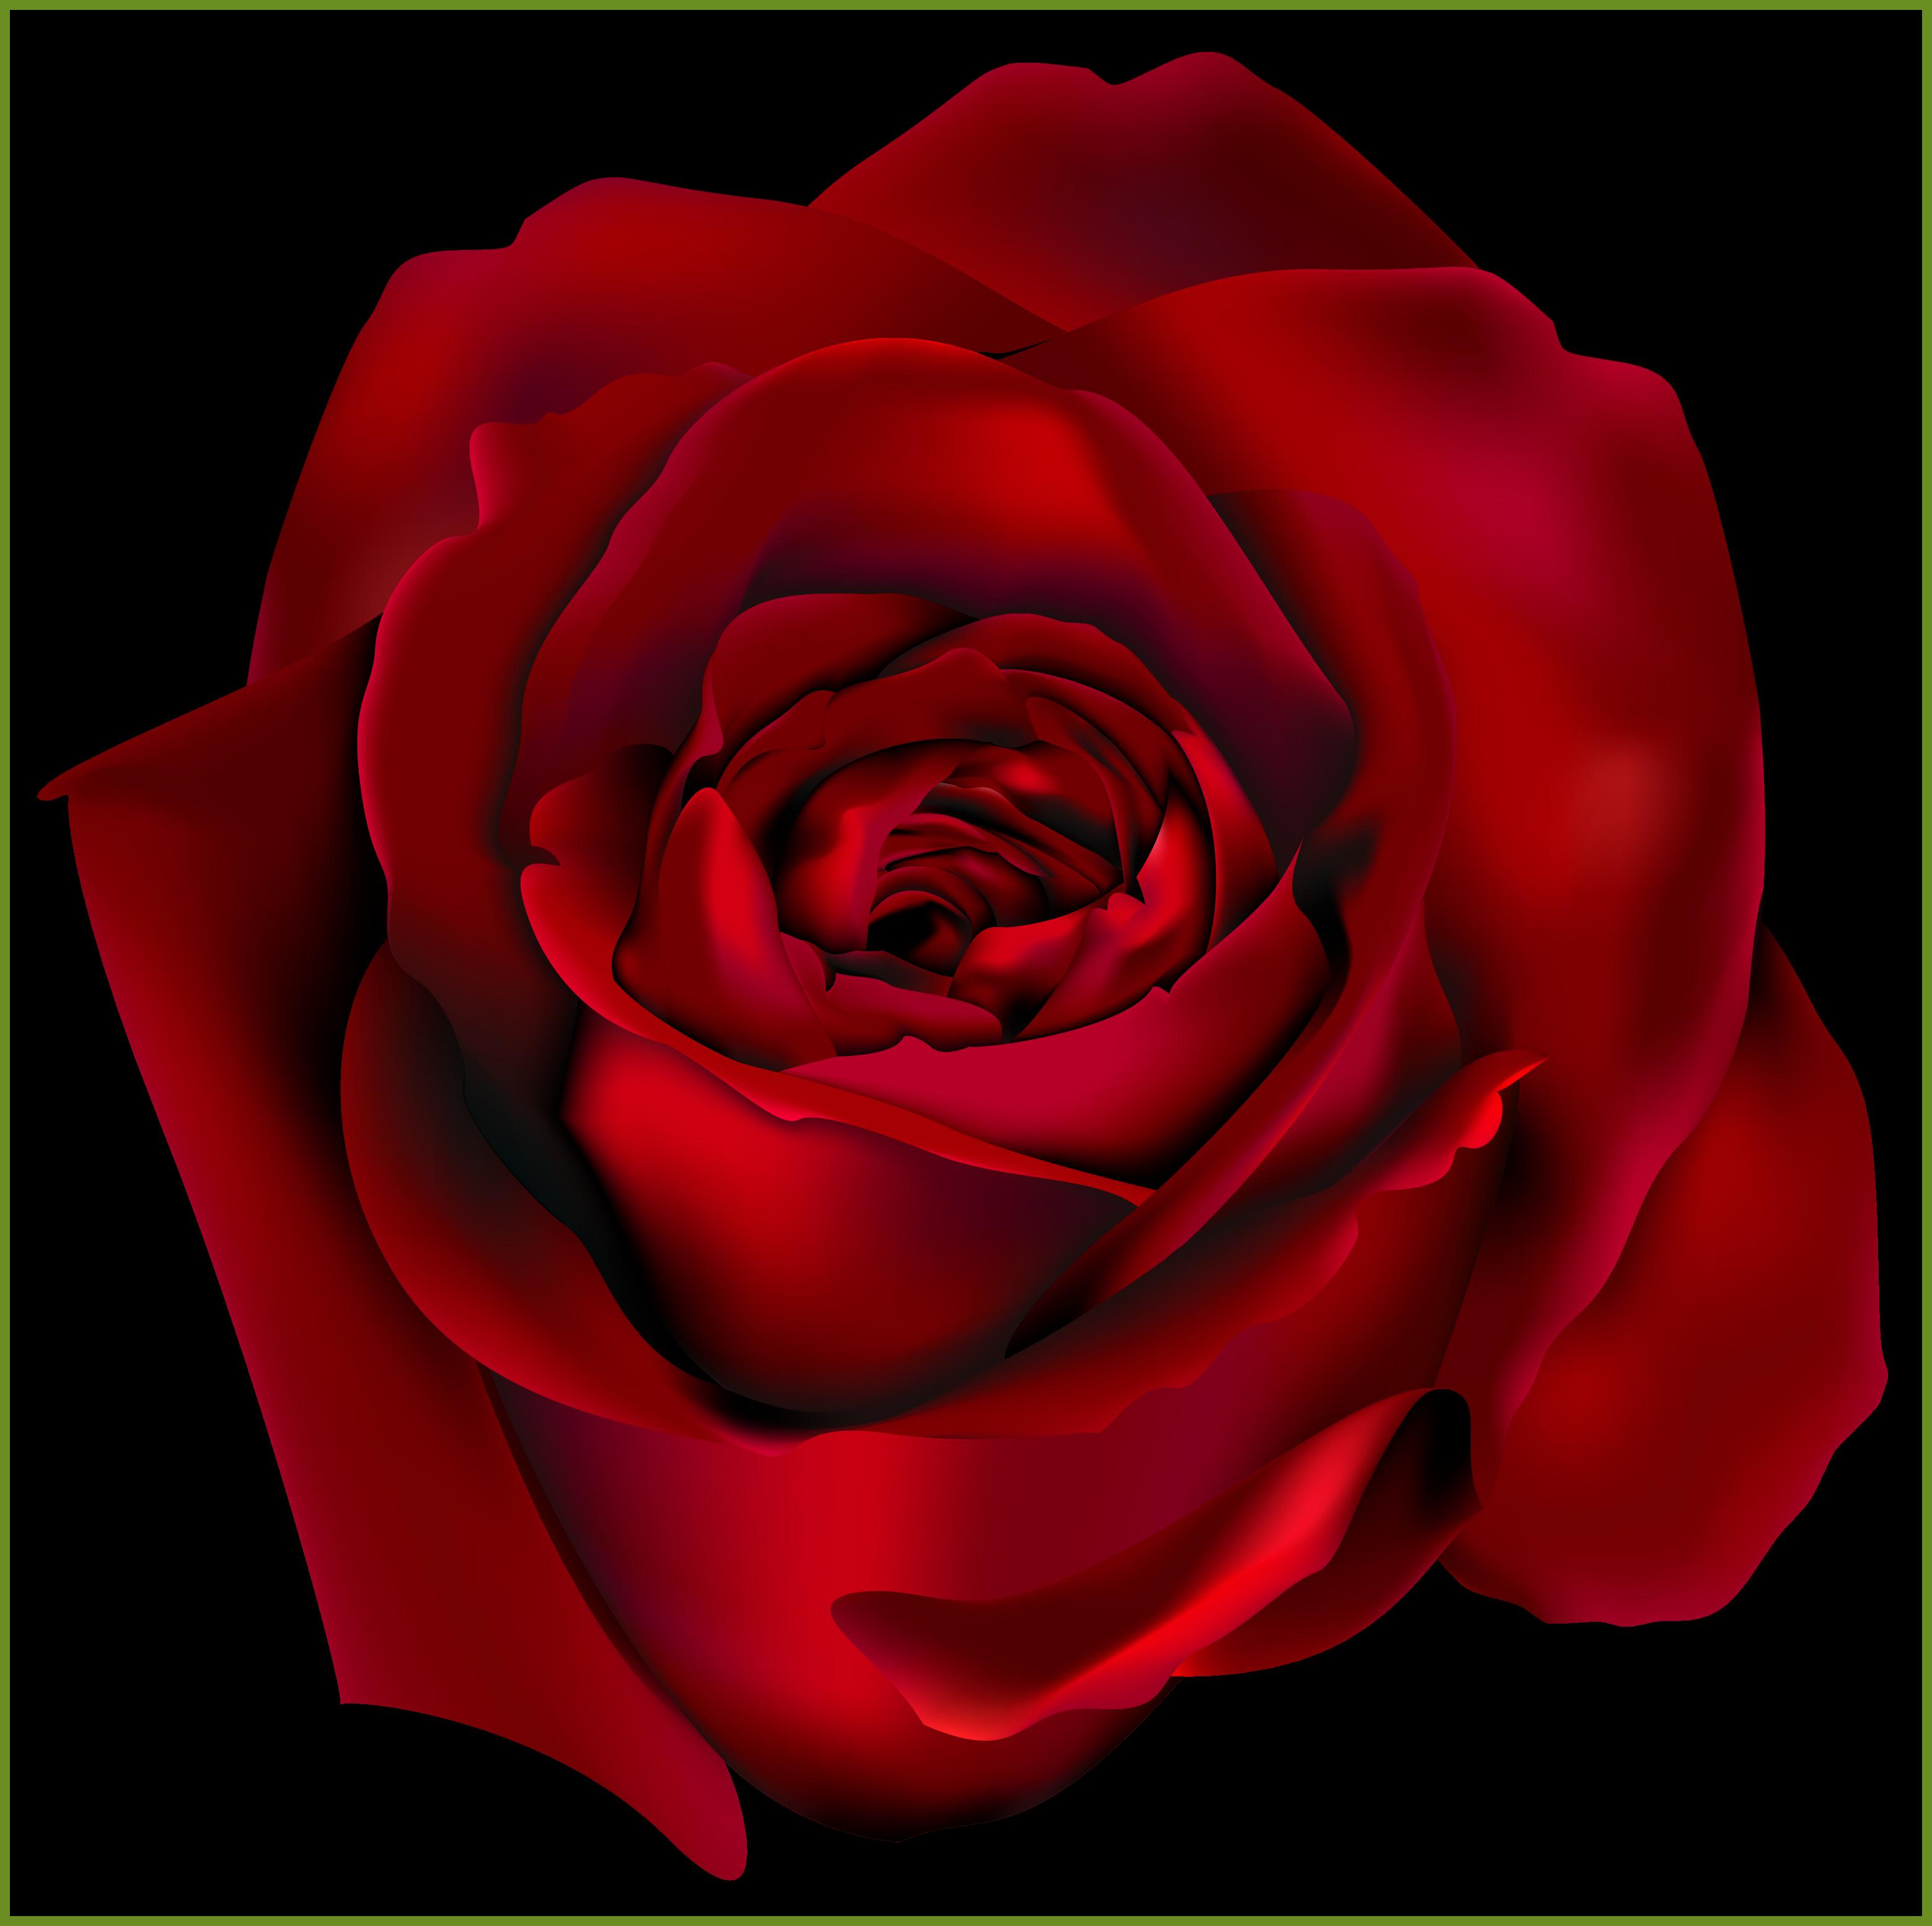 Unbelievable transparent red rose. Flower petals falling clipart